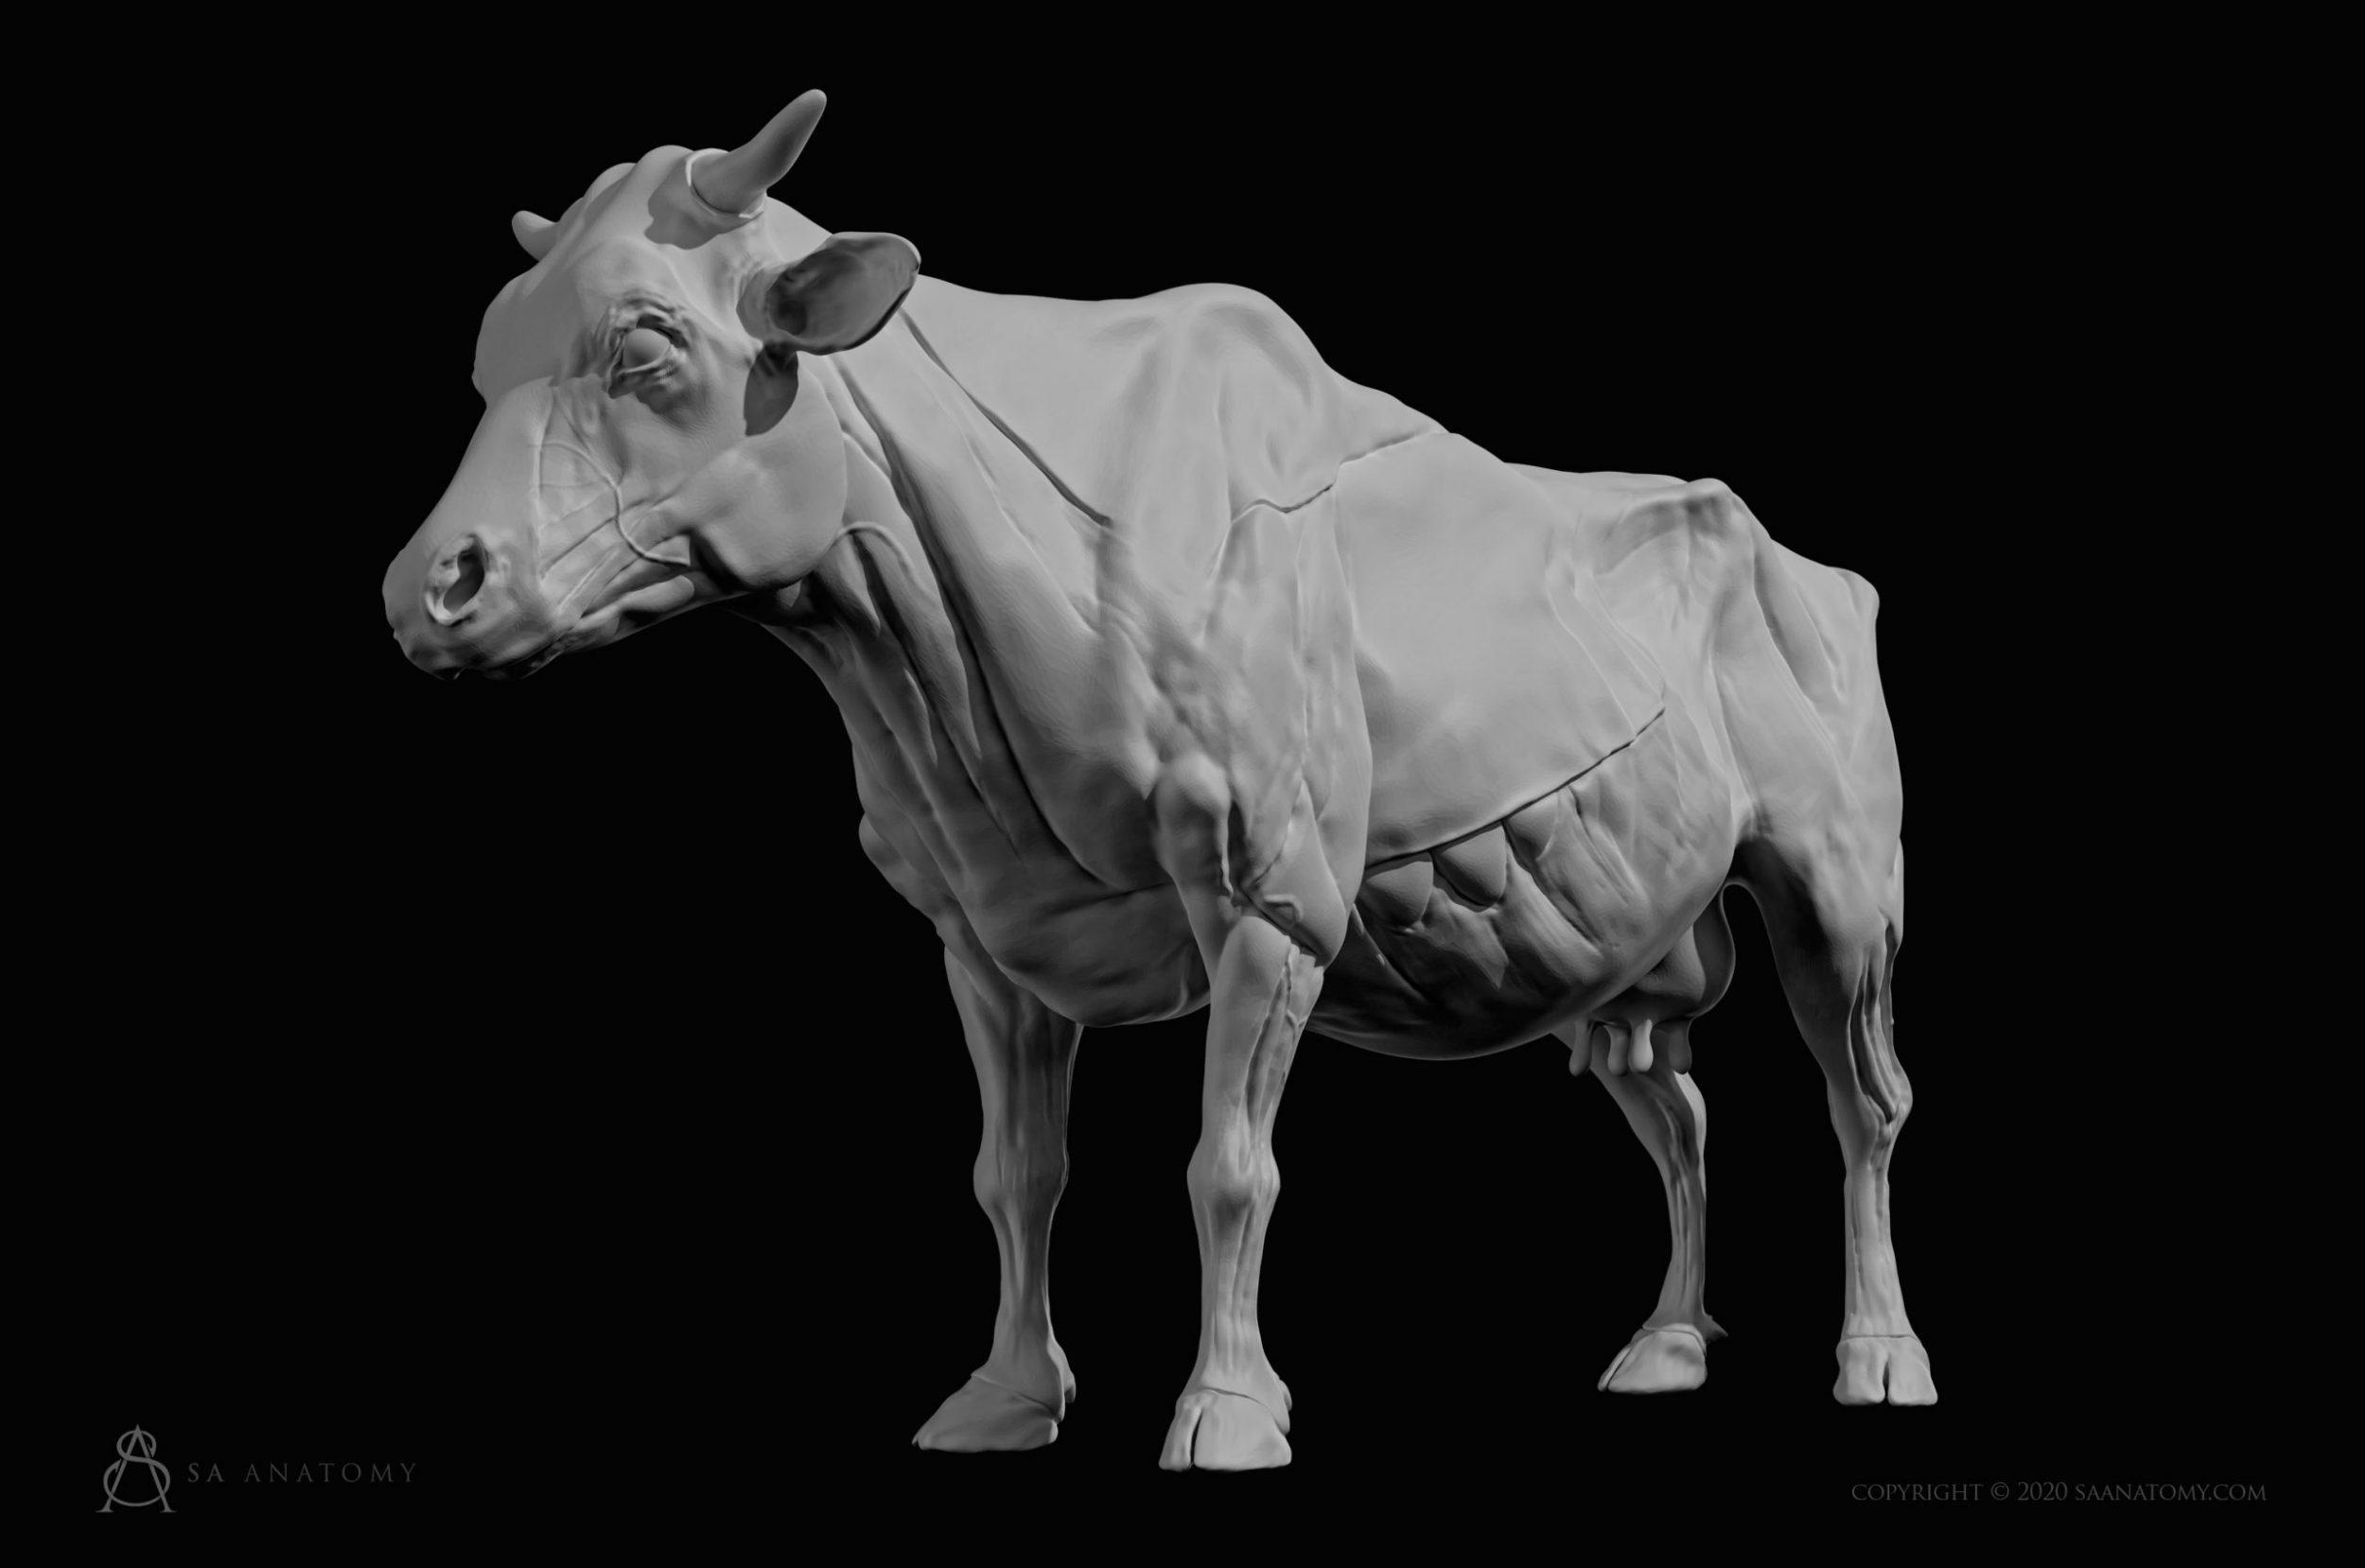 Cow-Bovine Anatomy